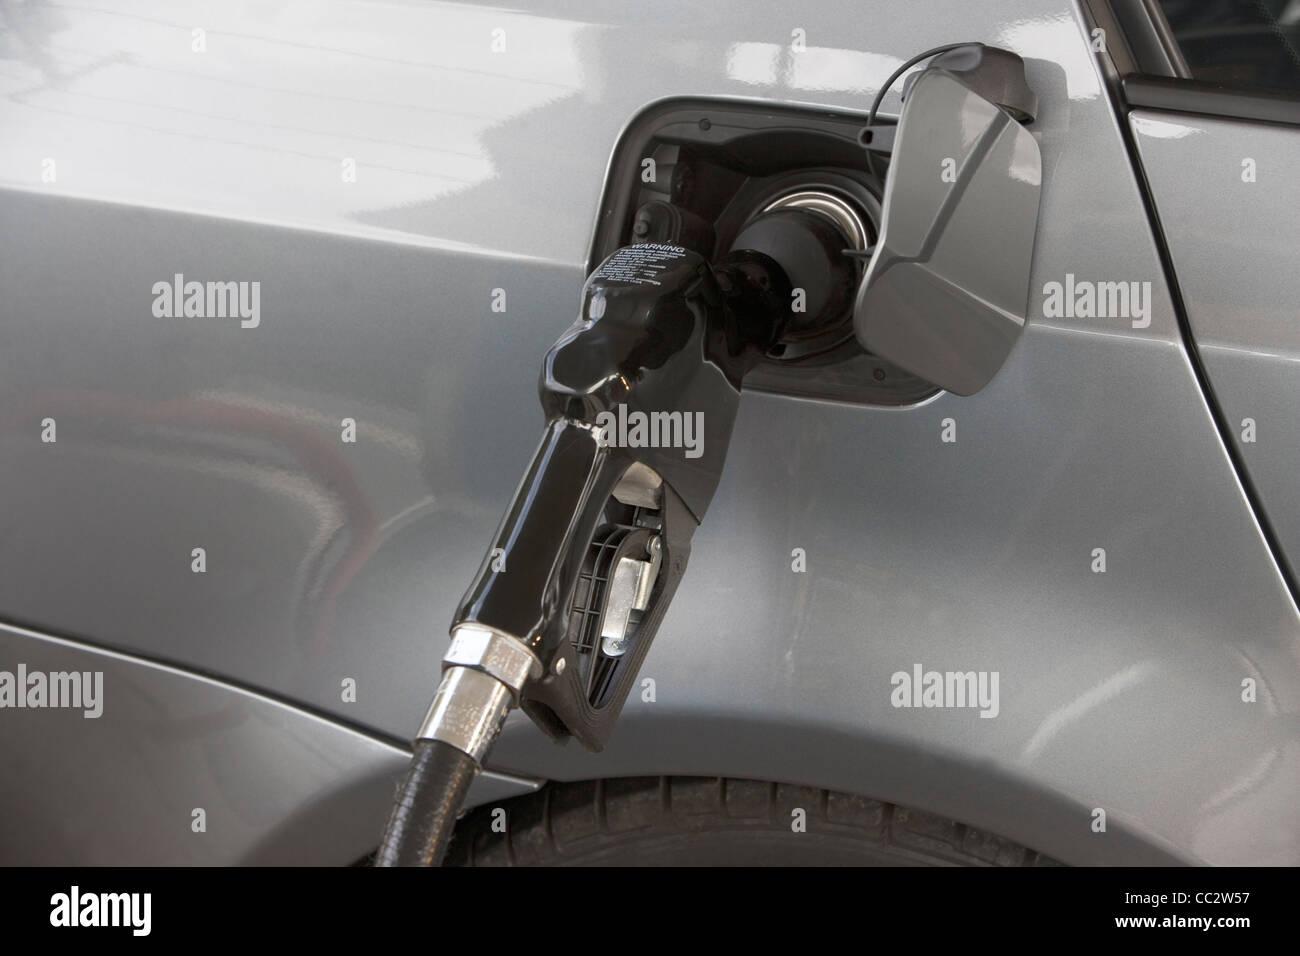 USA, New York, Long Island, East Hampton, Close-up of refueling pump - Stock Image